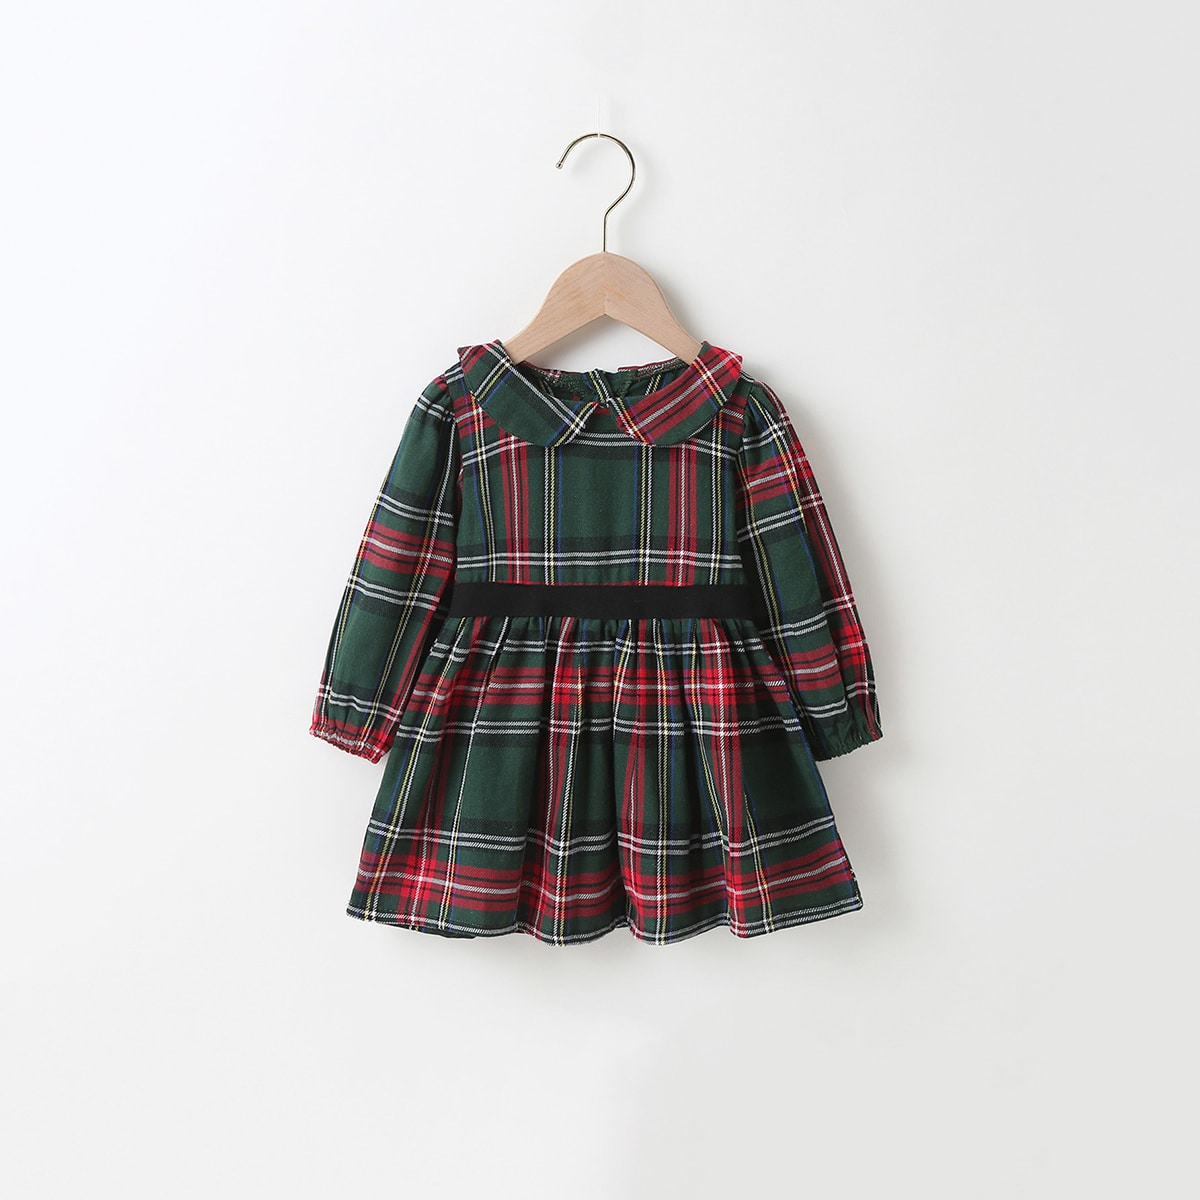 shein Preppy Ruitmotief Baby-jurk Knoop